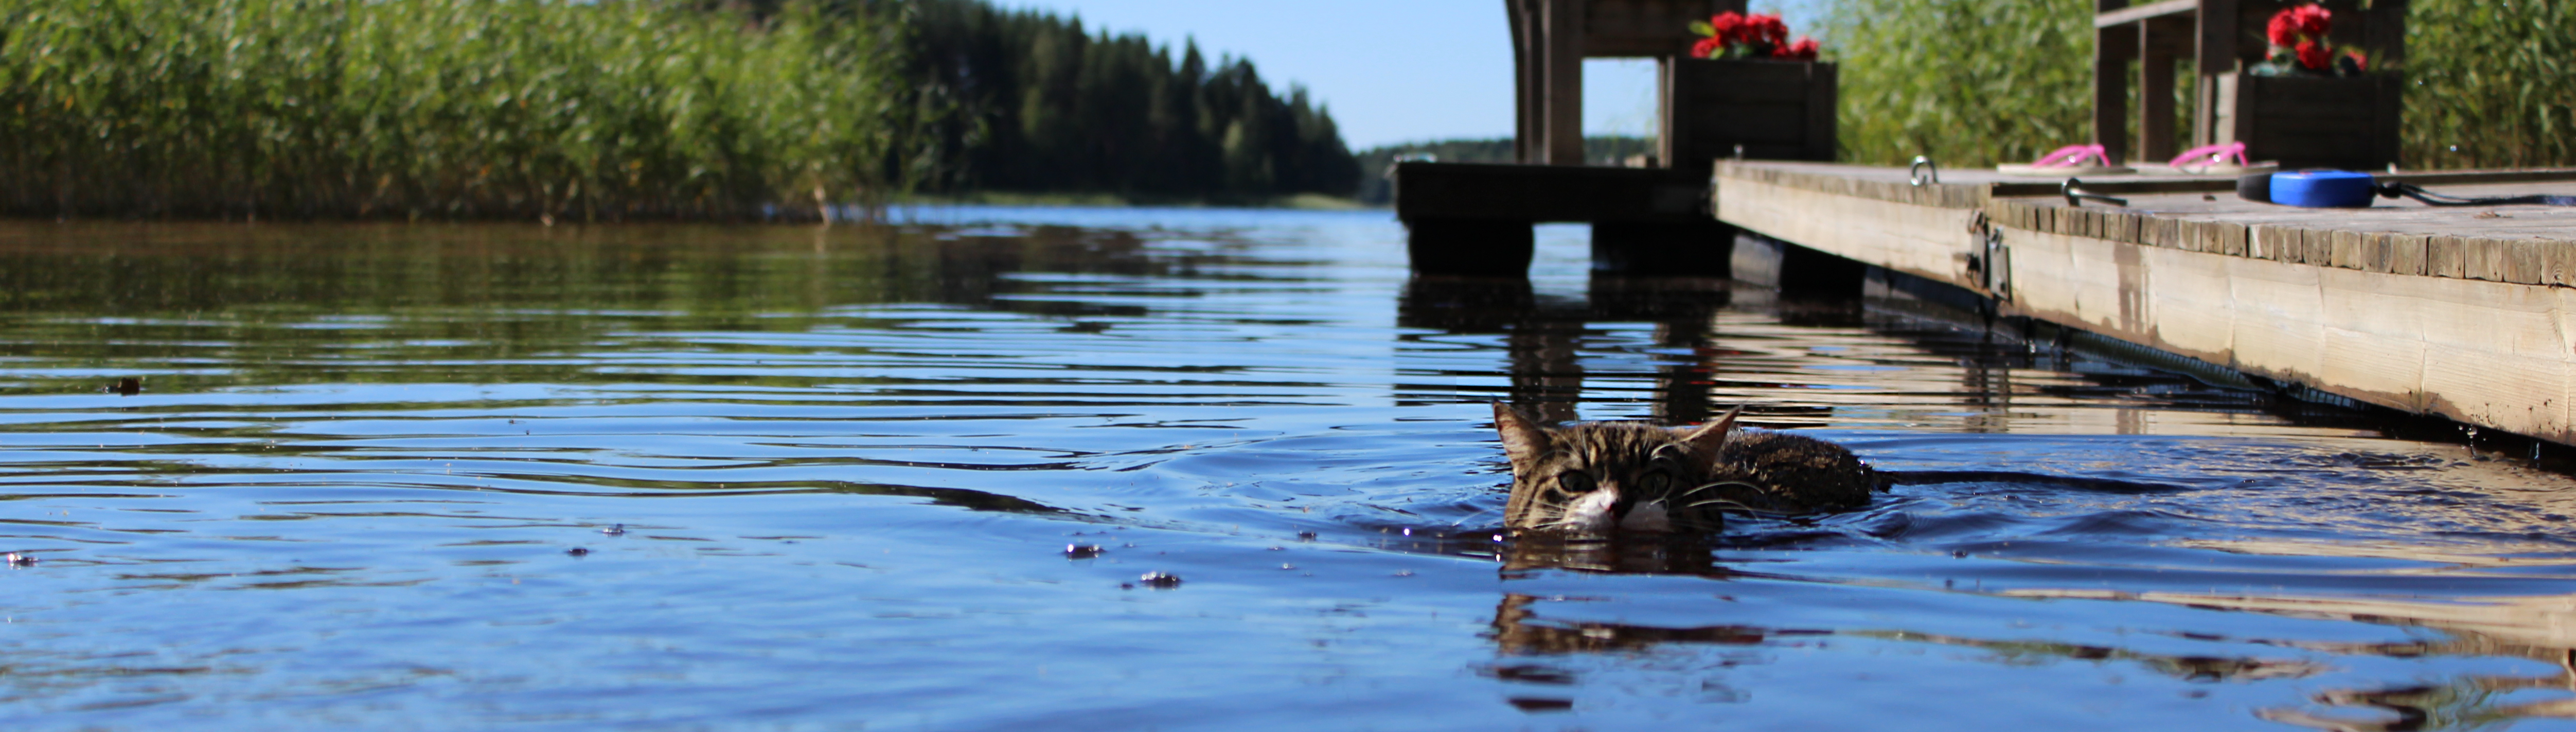 Miisa having a quick swim.., Animal, Grey, Tabby, Pet, HQ Photo